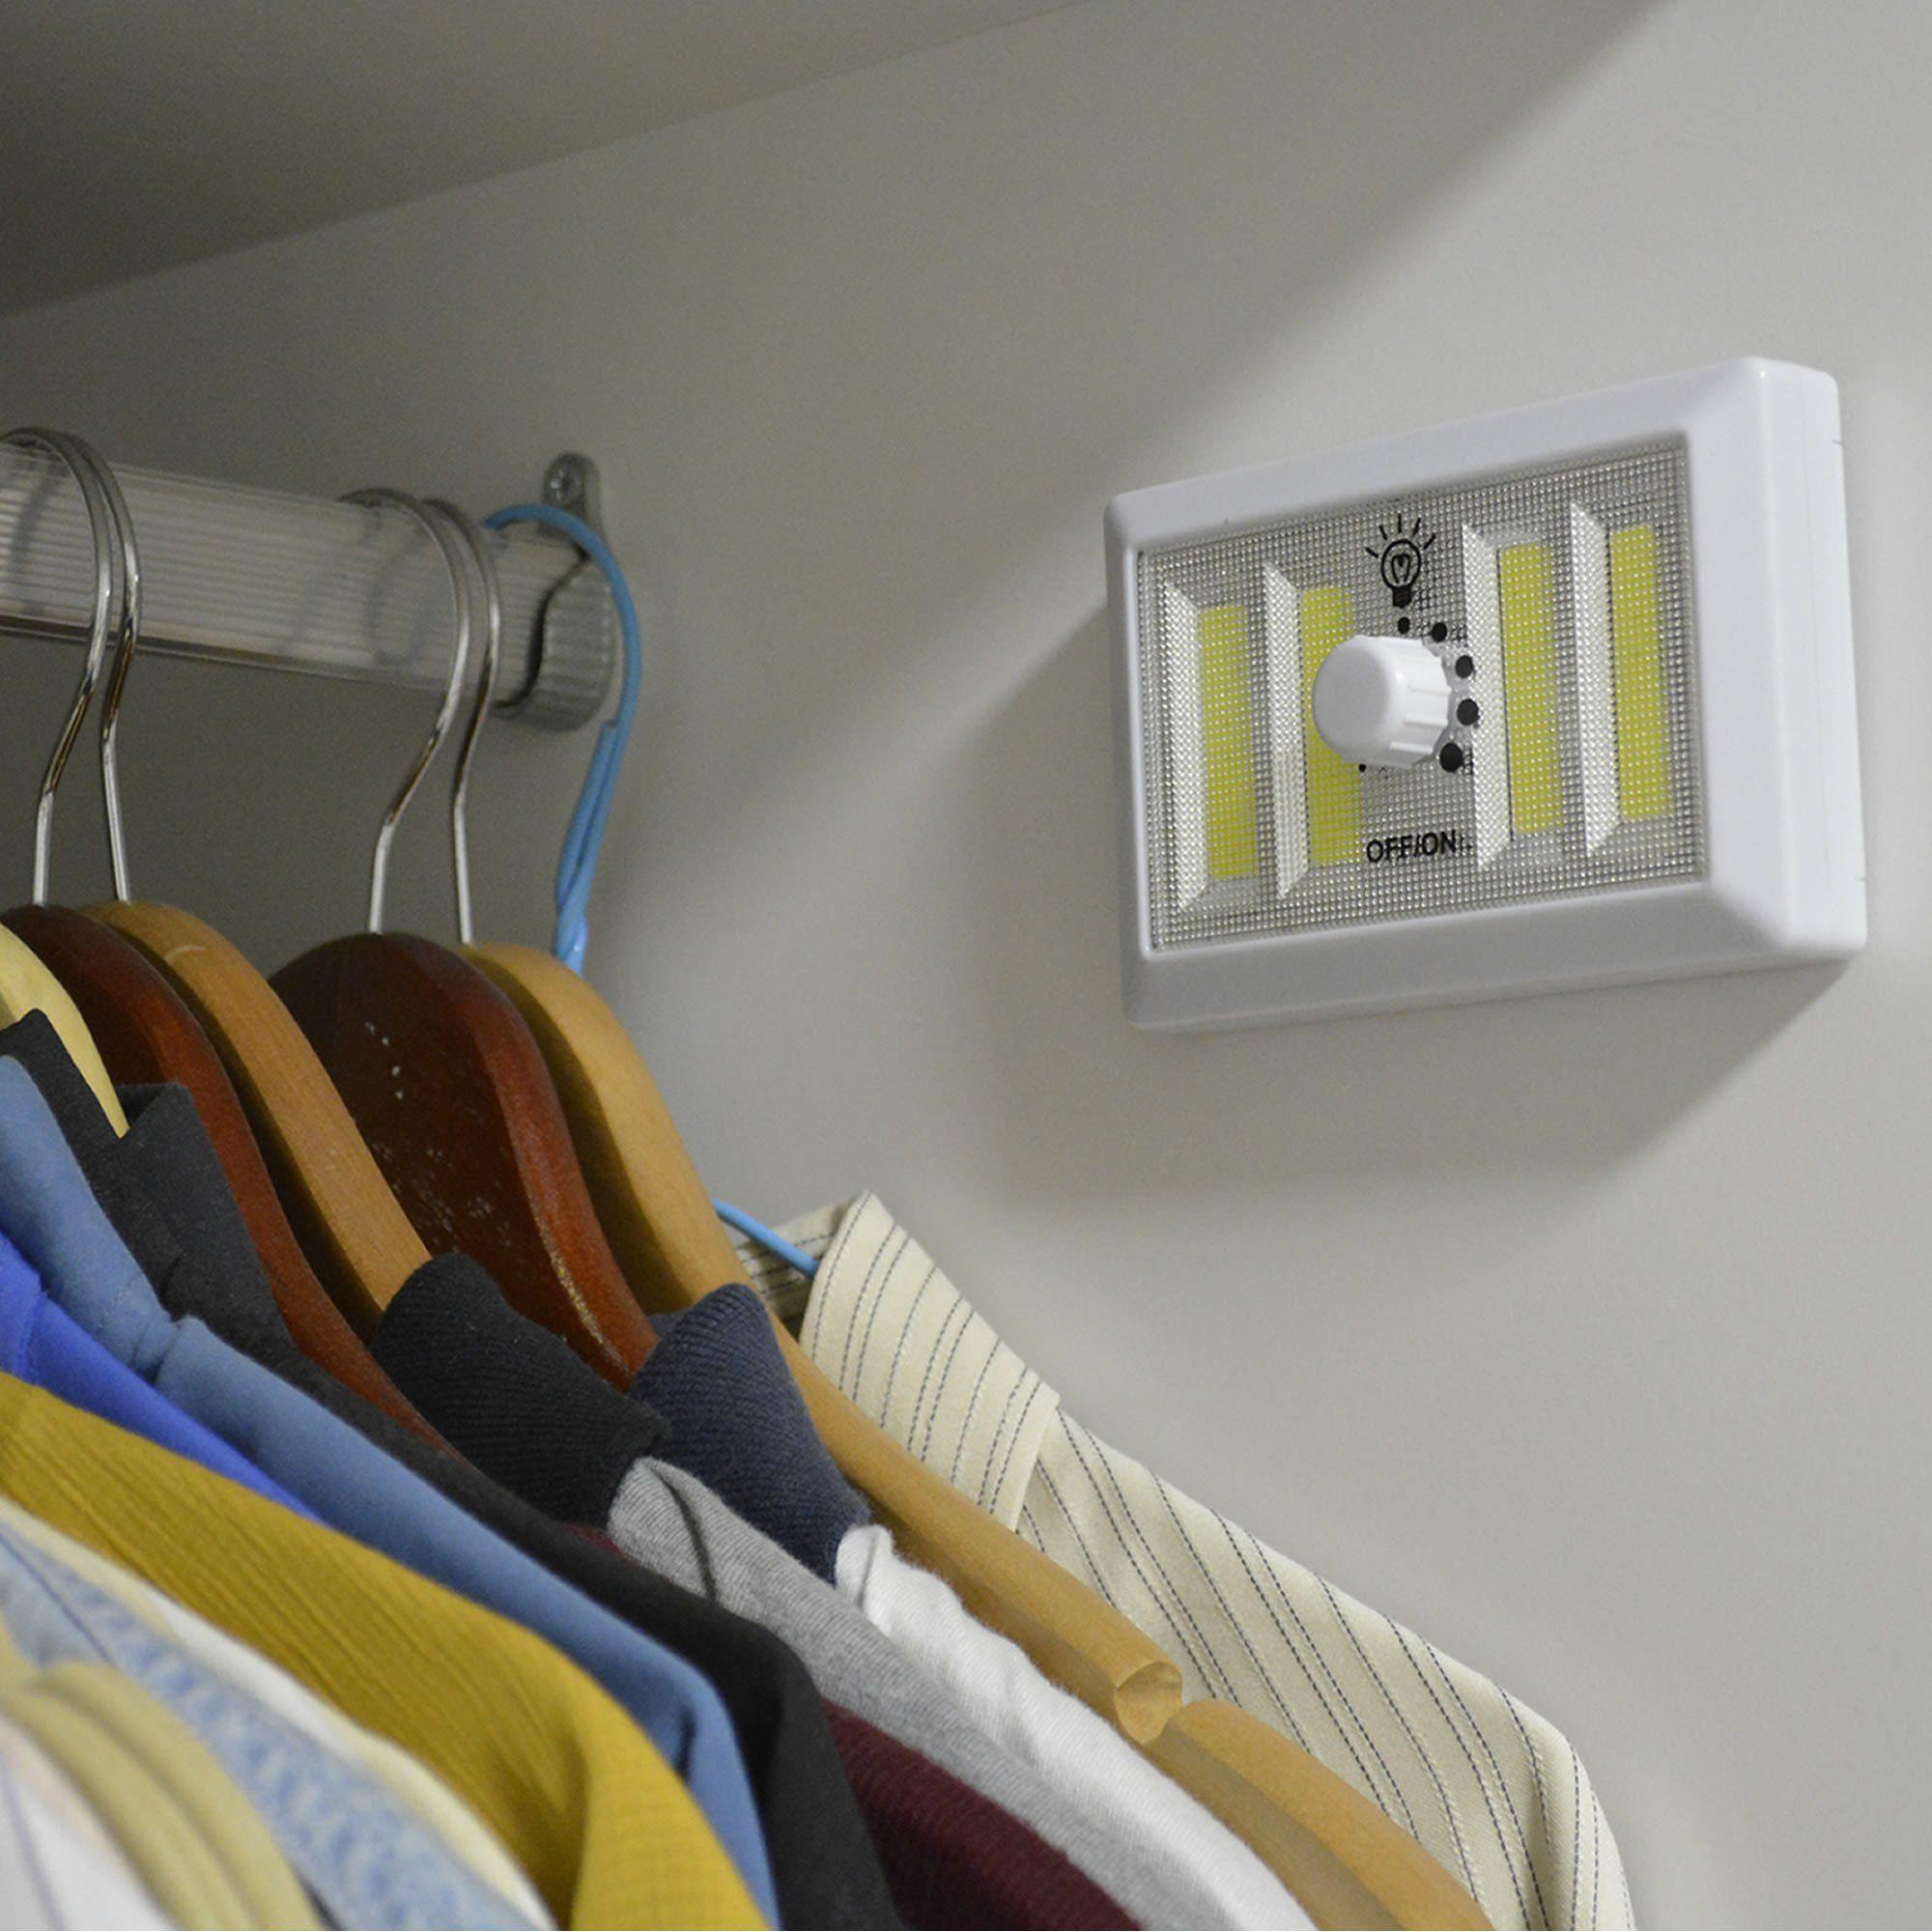 Mini Luminária LED Portátil Regulável com Imã CBRN06816